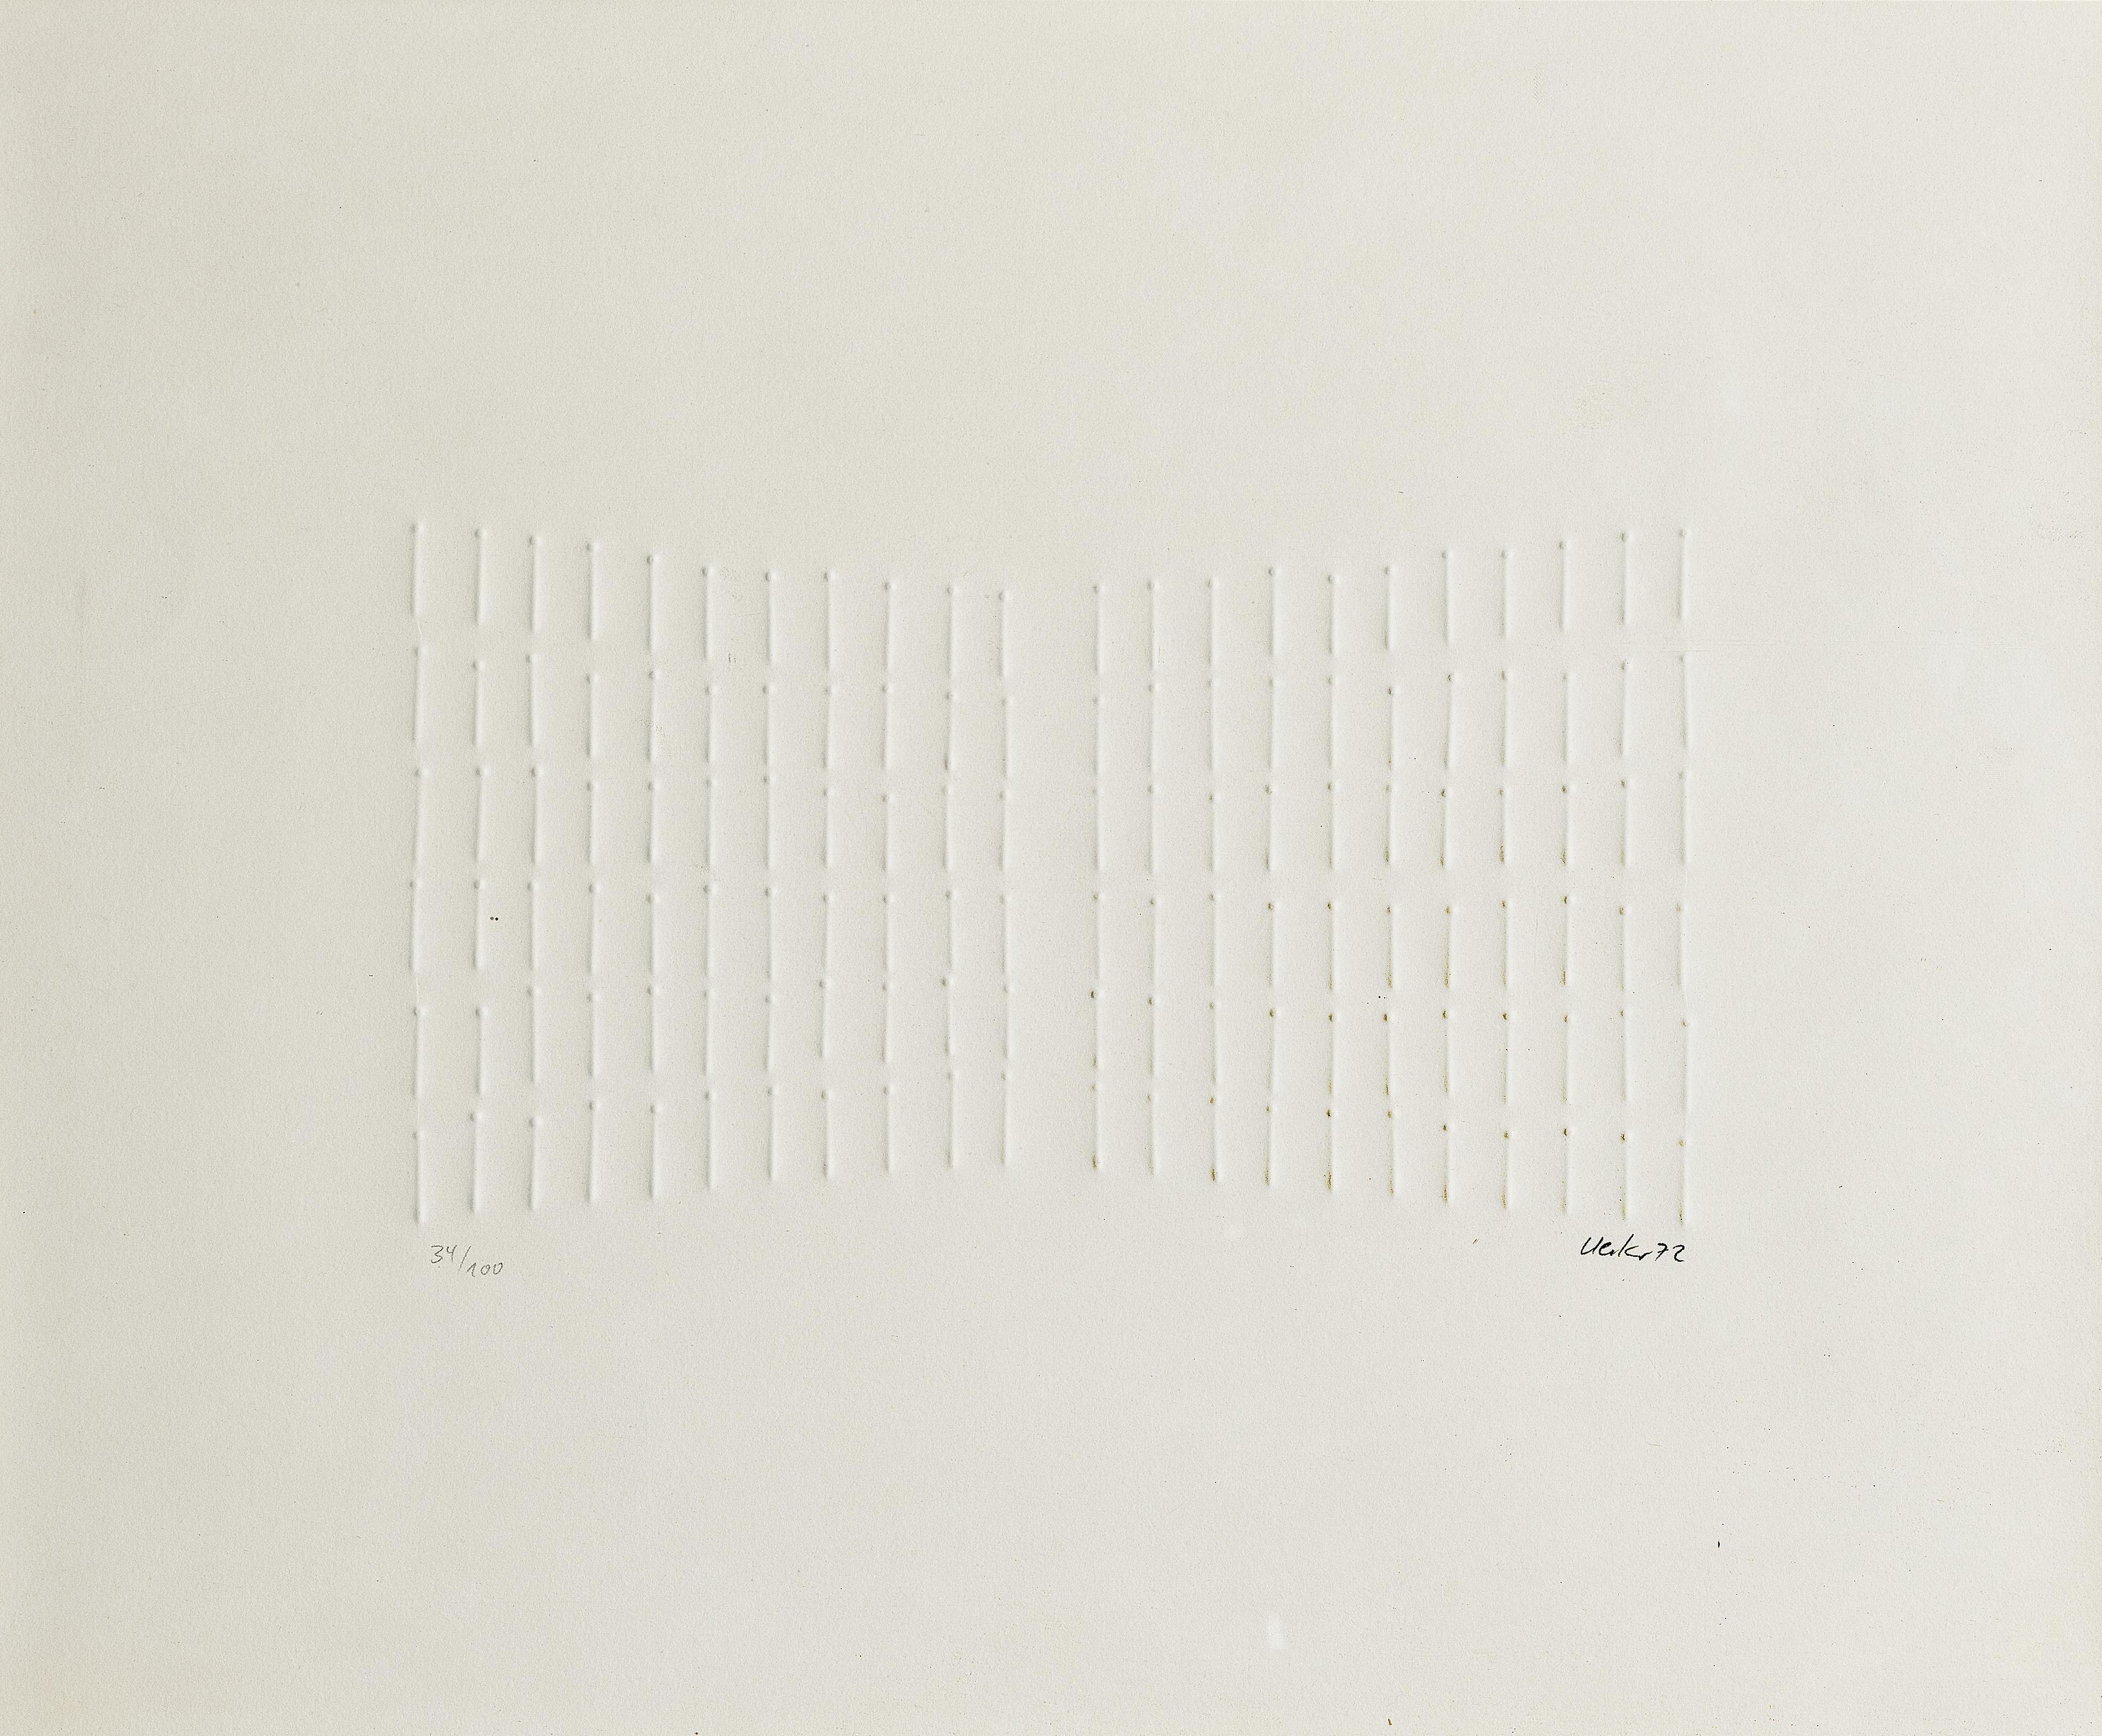 Gunther Uecker-Reihung (Sequence)-1972